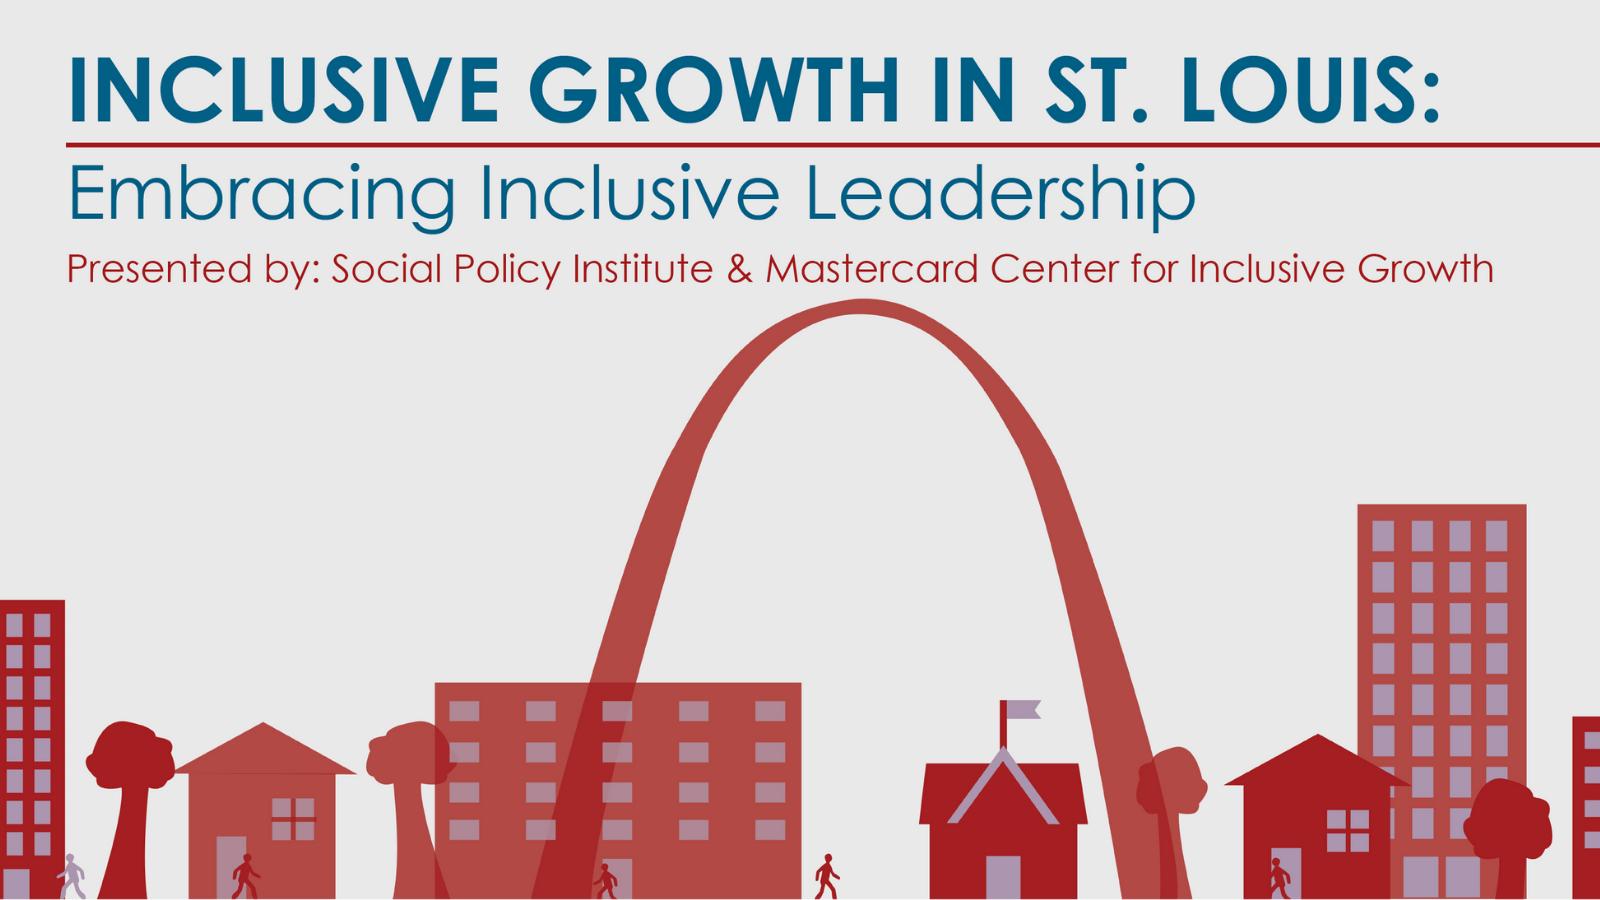 Embracing Inclusive Leadership